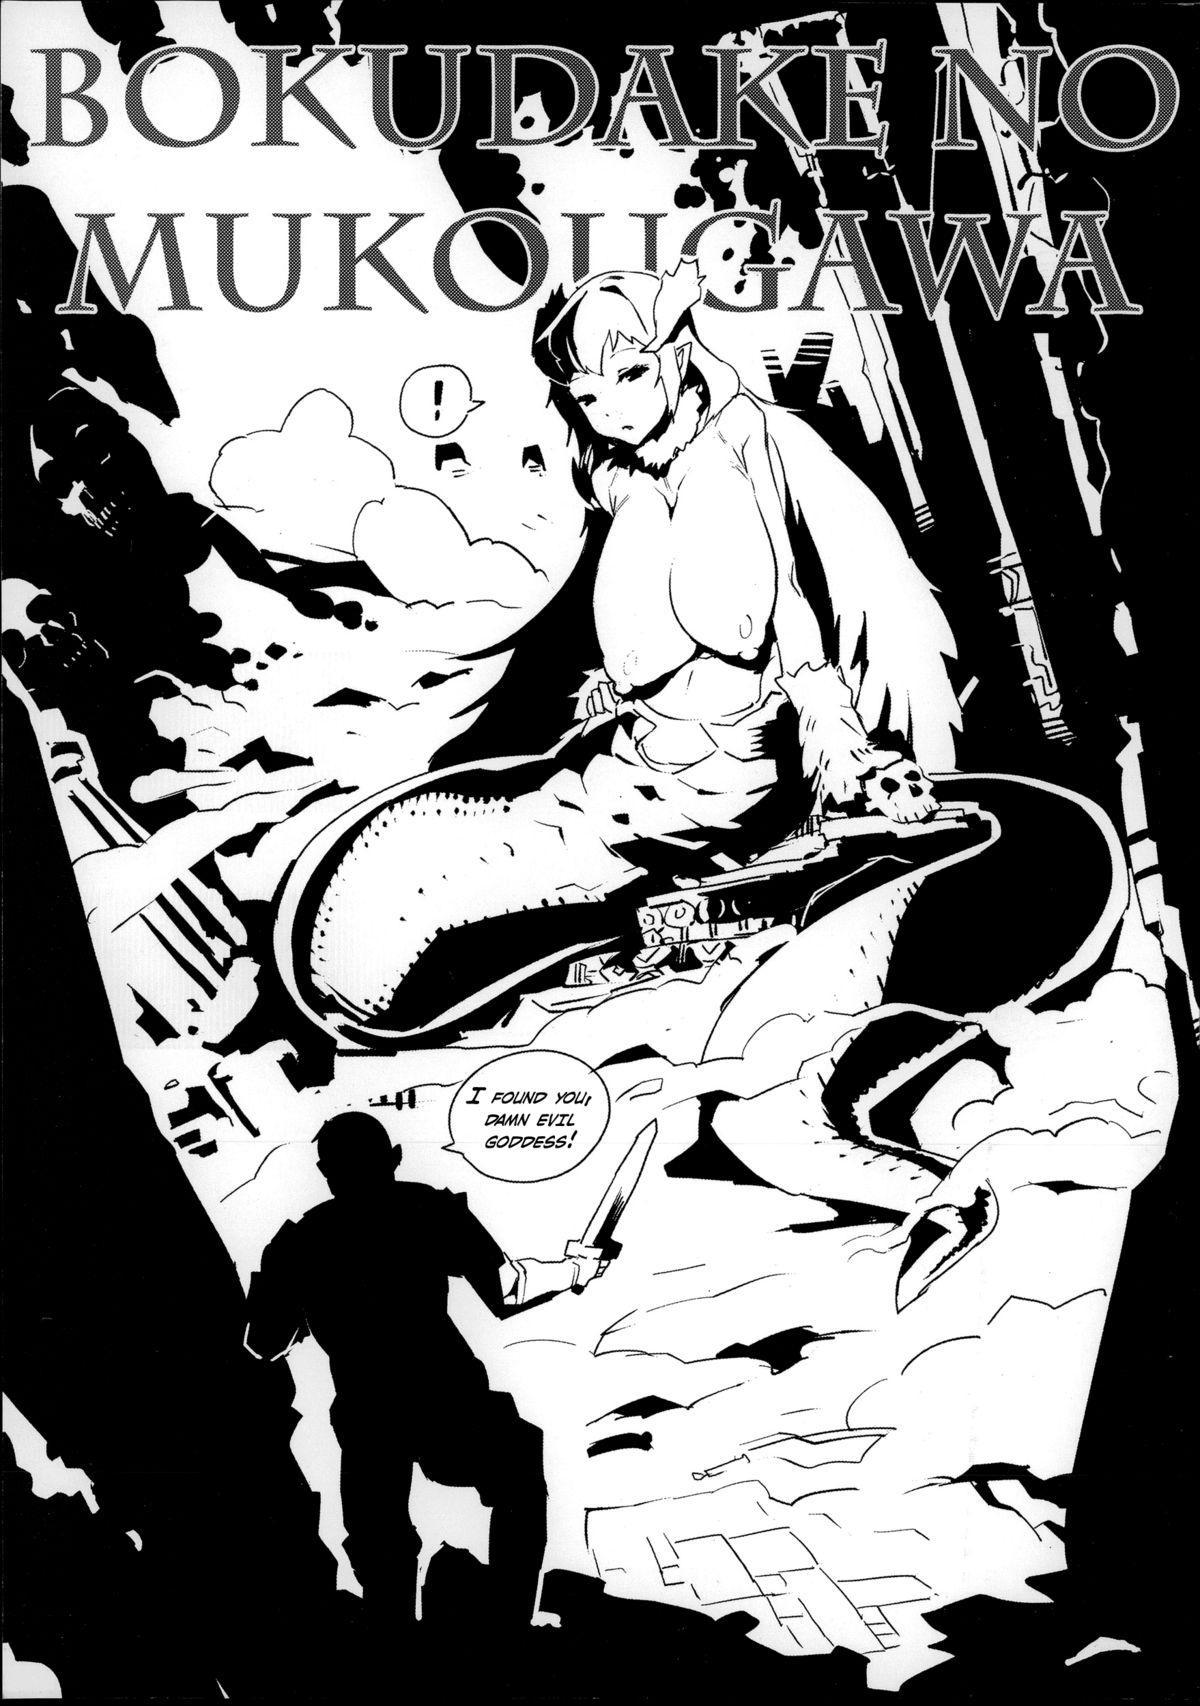 [AHOBAKA] Bokudakeno Mukougawa Ch. 0-1, 3-5, 7, 9 [English] [MintVoid + Vile + SaHa + thetsuuyaku] 2